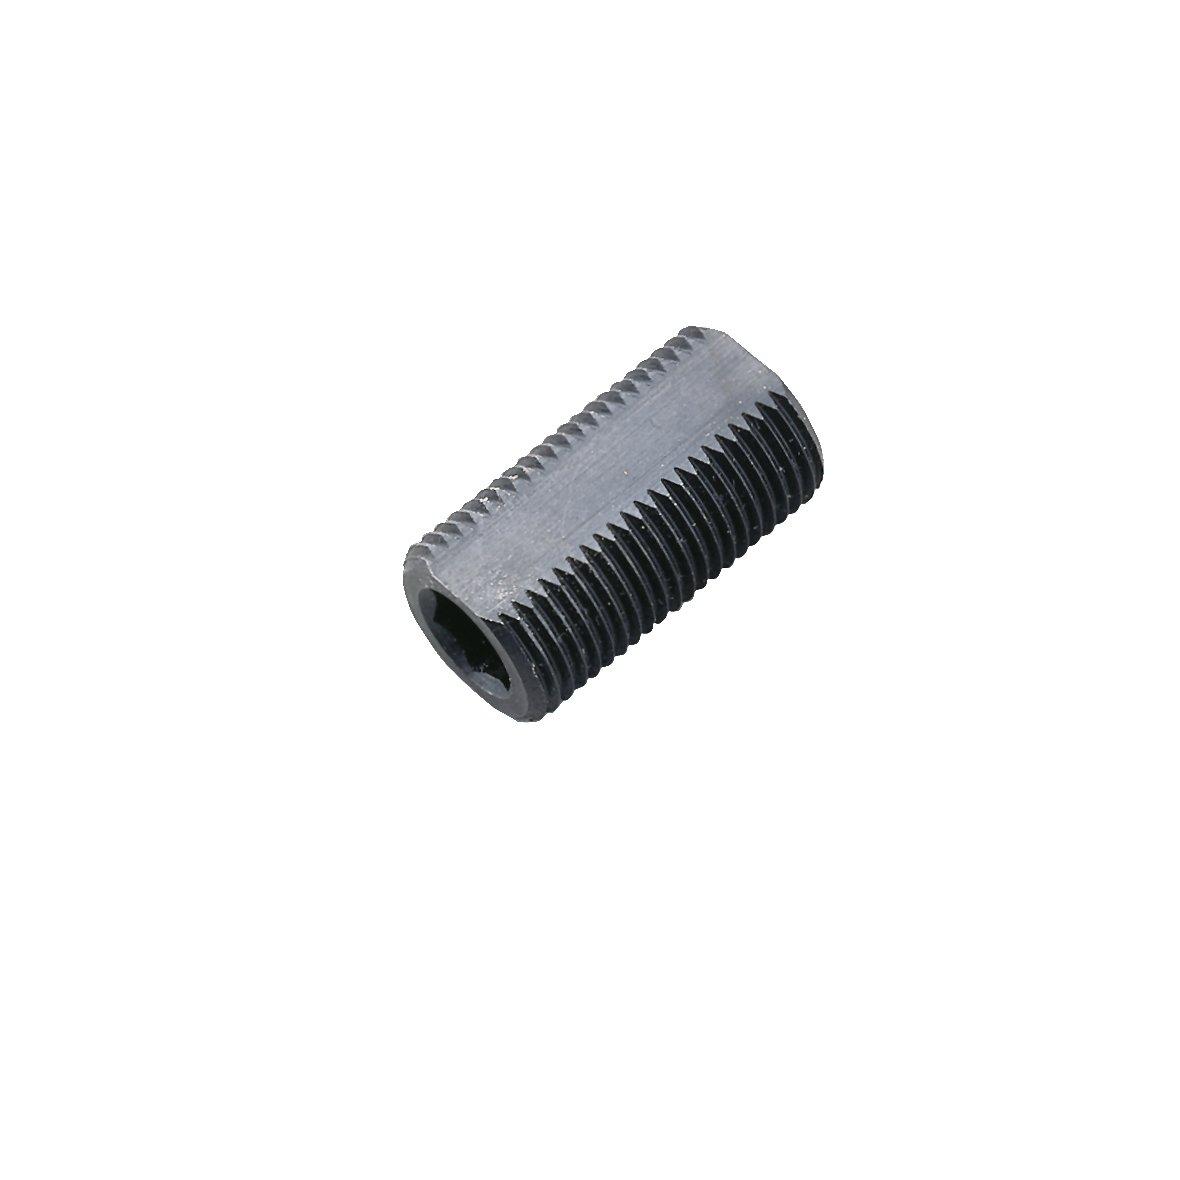 Haimer 85.810.40.3 Adjustment Bolt for Power Chuck Shrink with 18 mm Diameter